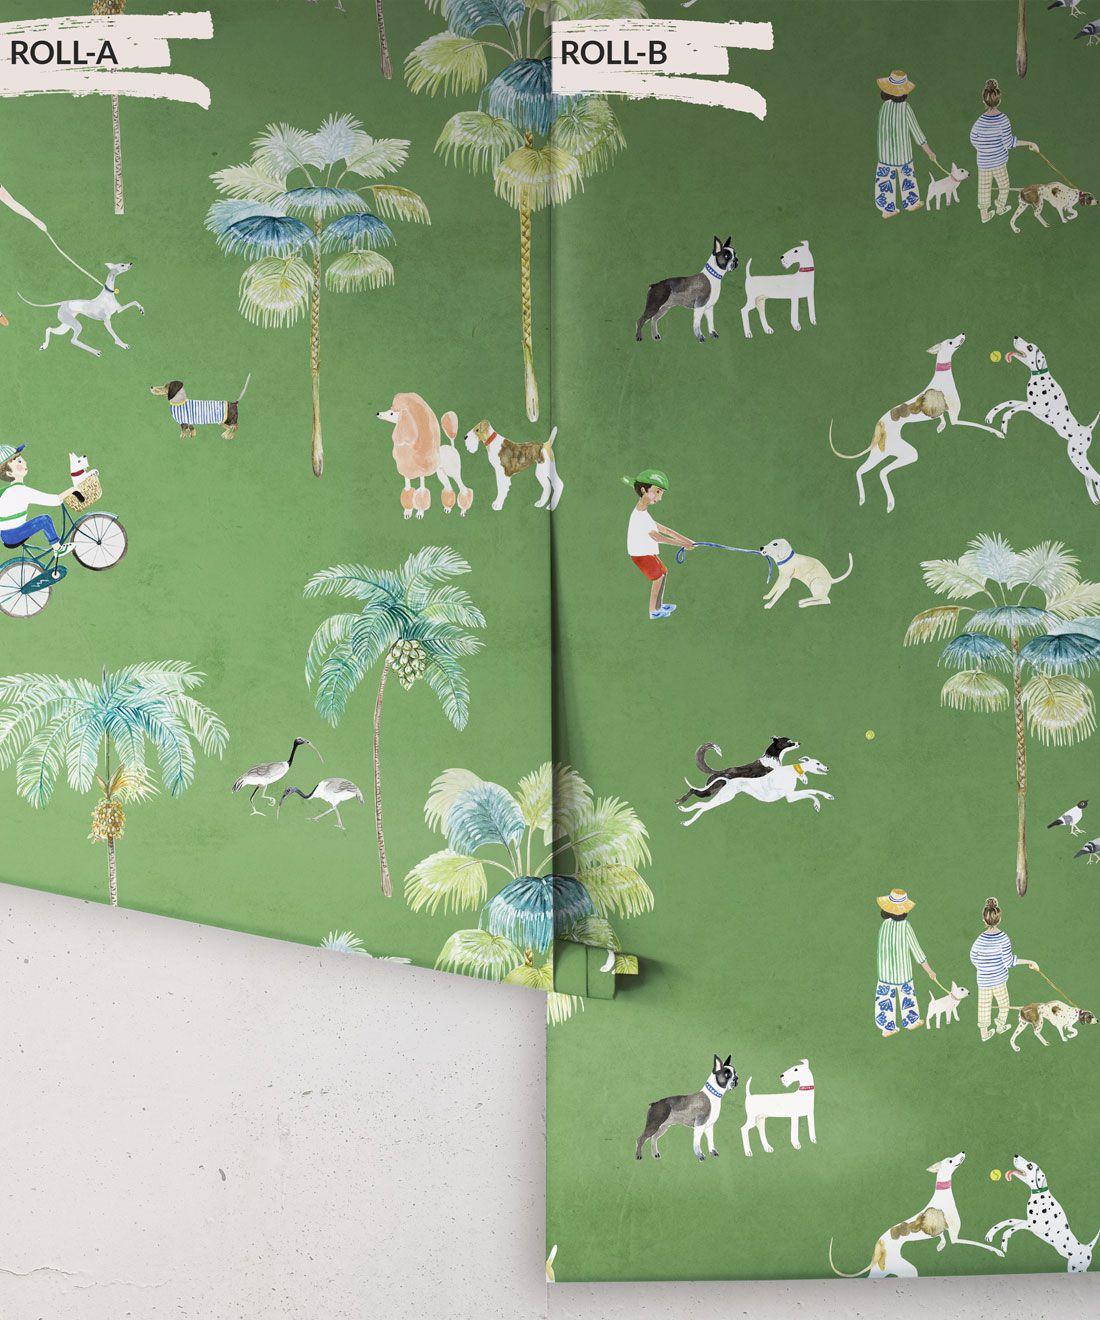 At The Dog Park Wallpaper •Kids Wallpaper • Green • Rolls